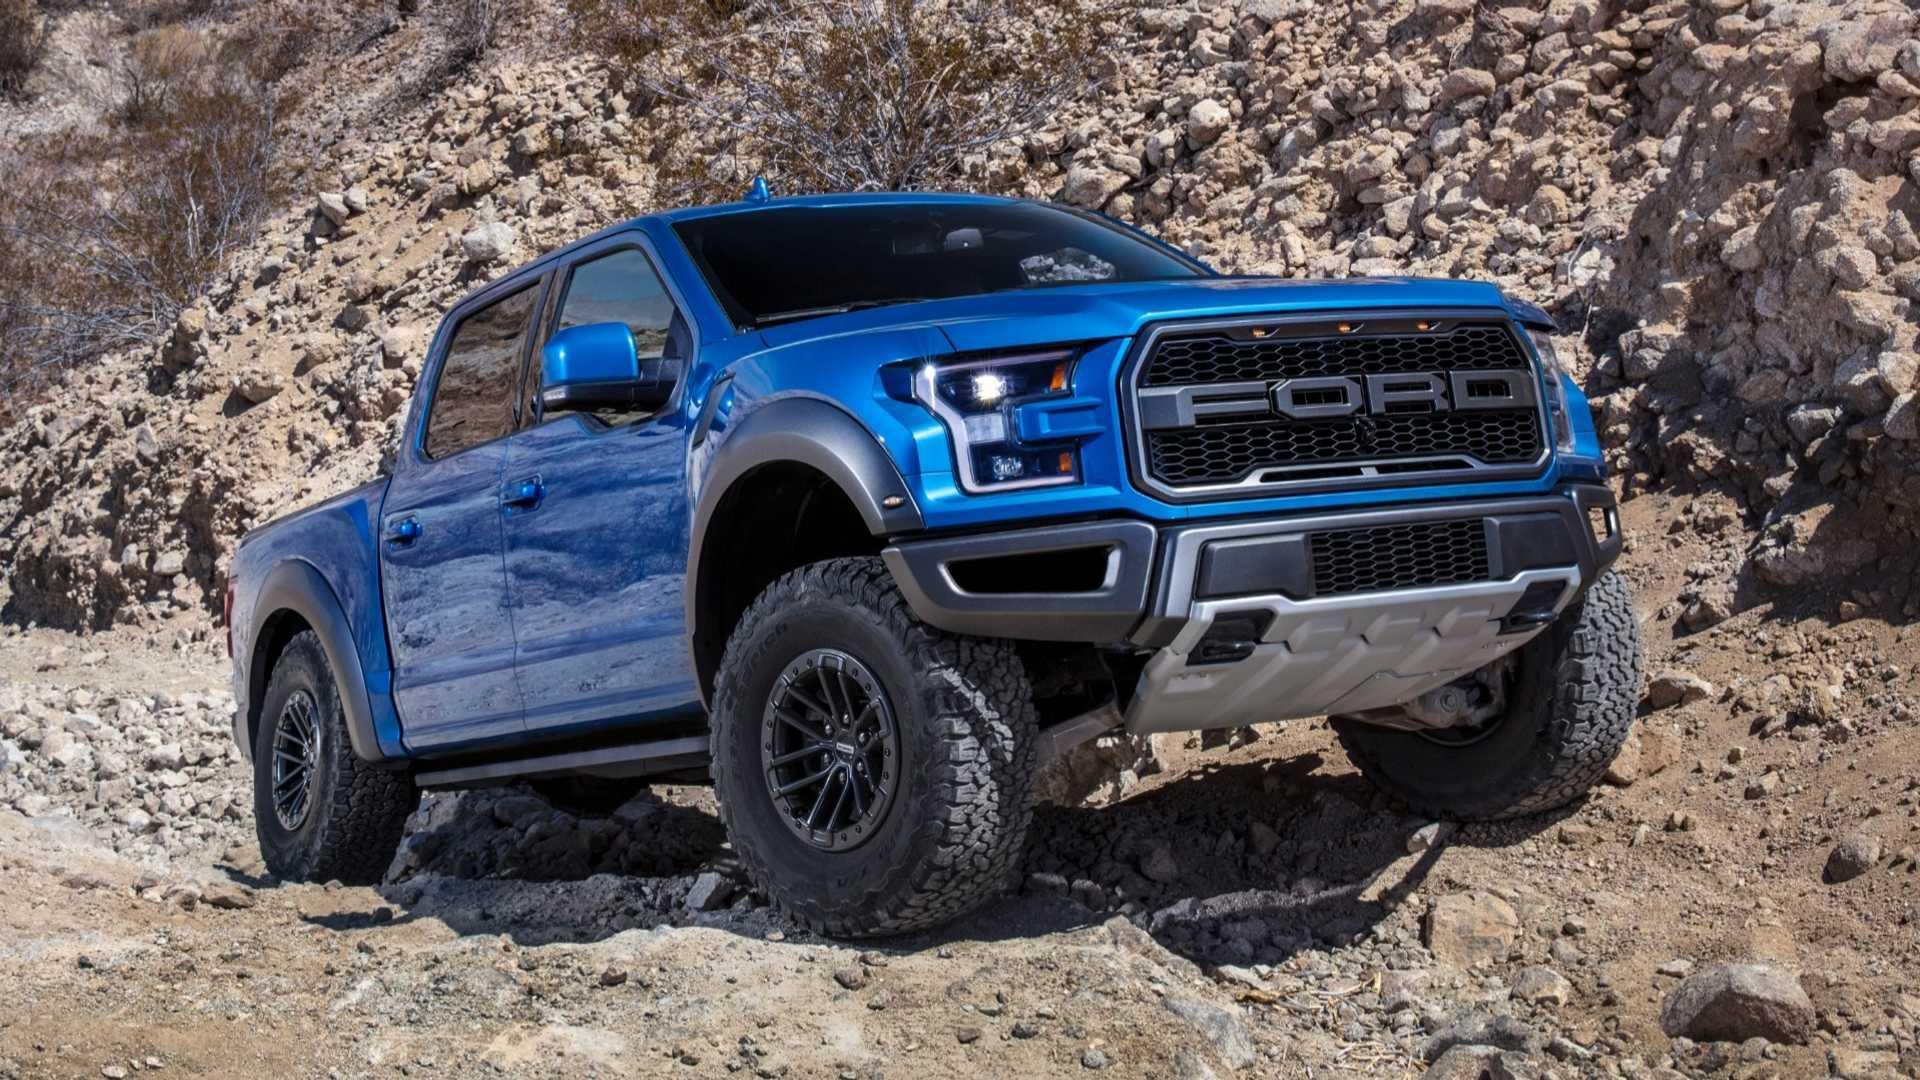 74 All New Ford Velociraptor 2019 Spesification Ratings with Ford Velociraptor 2019 Spesification